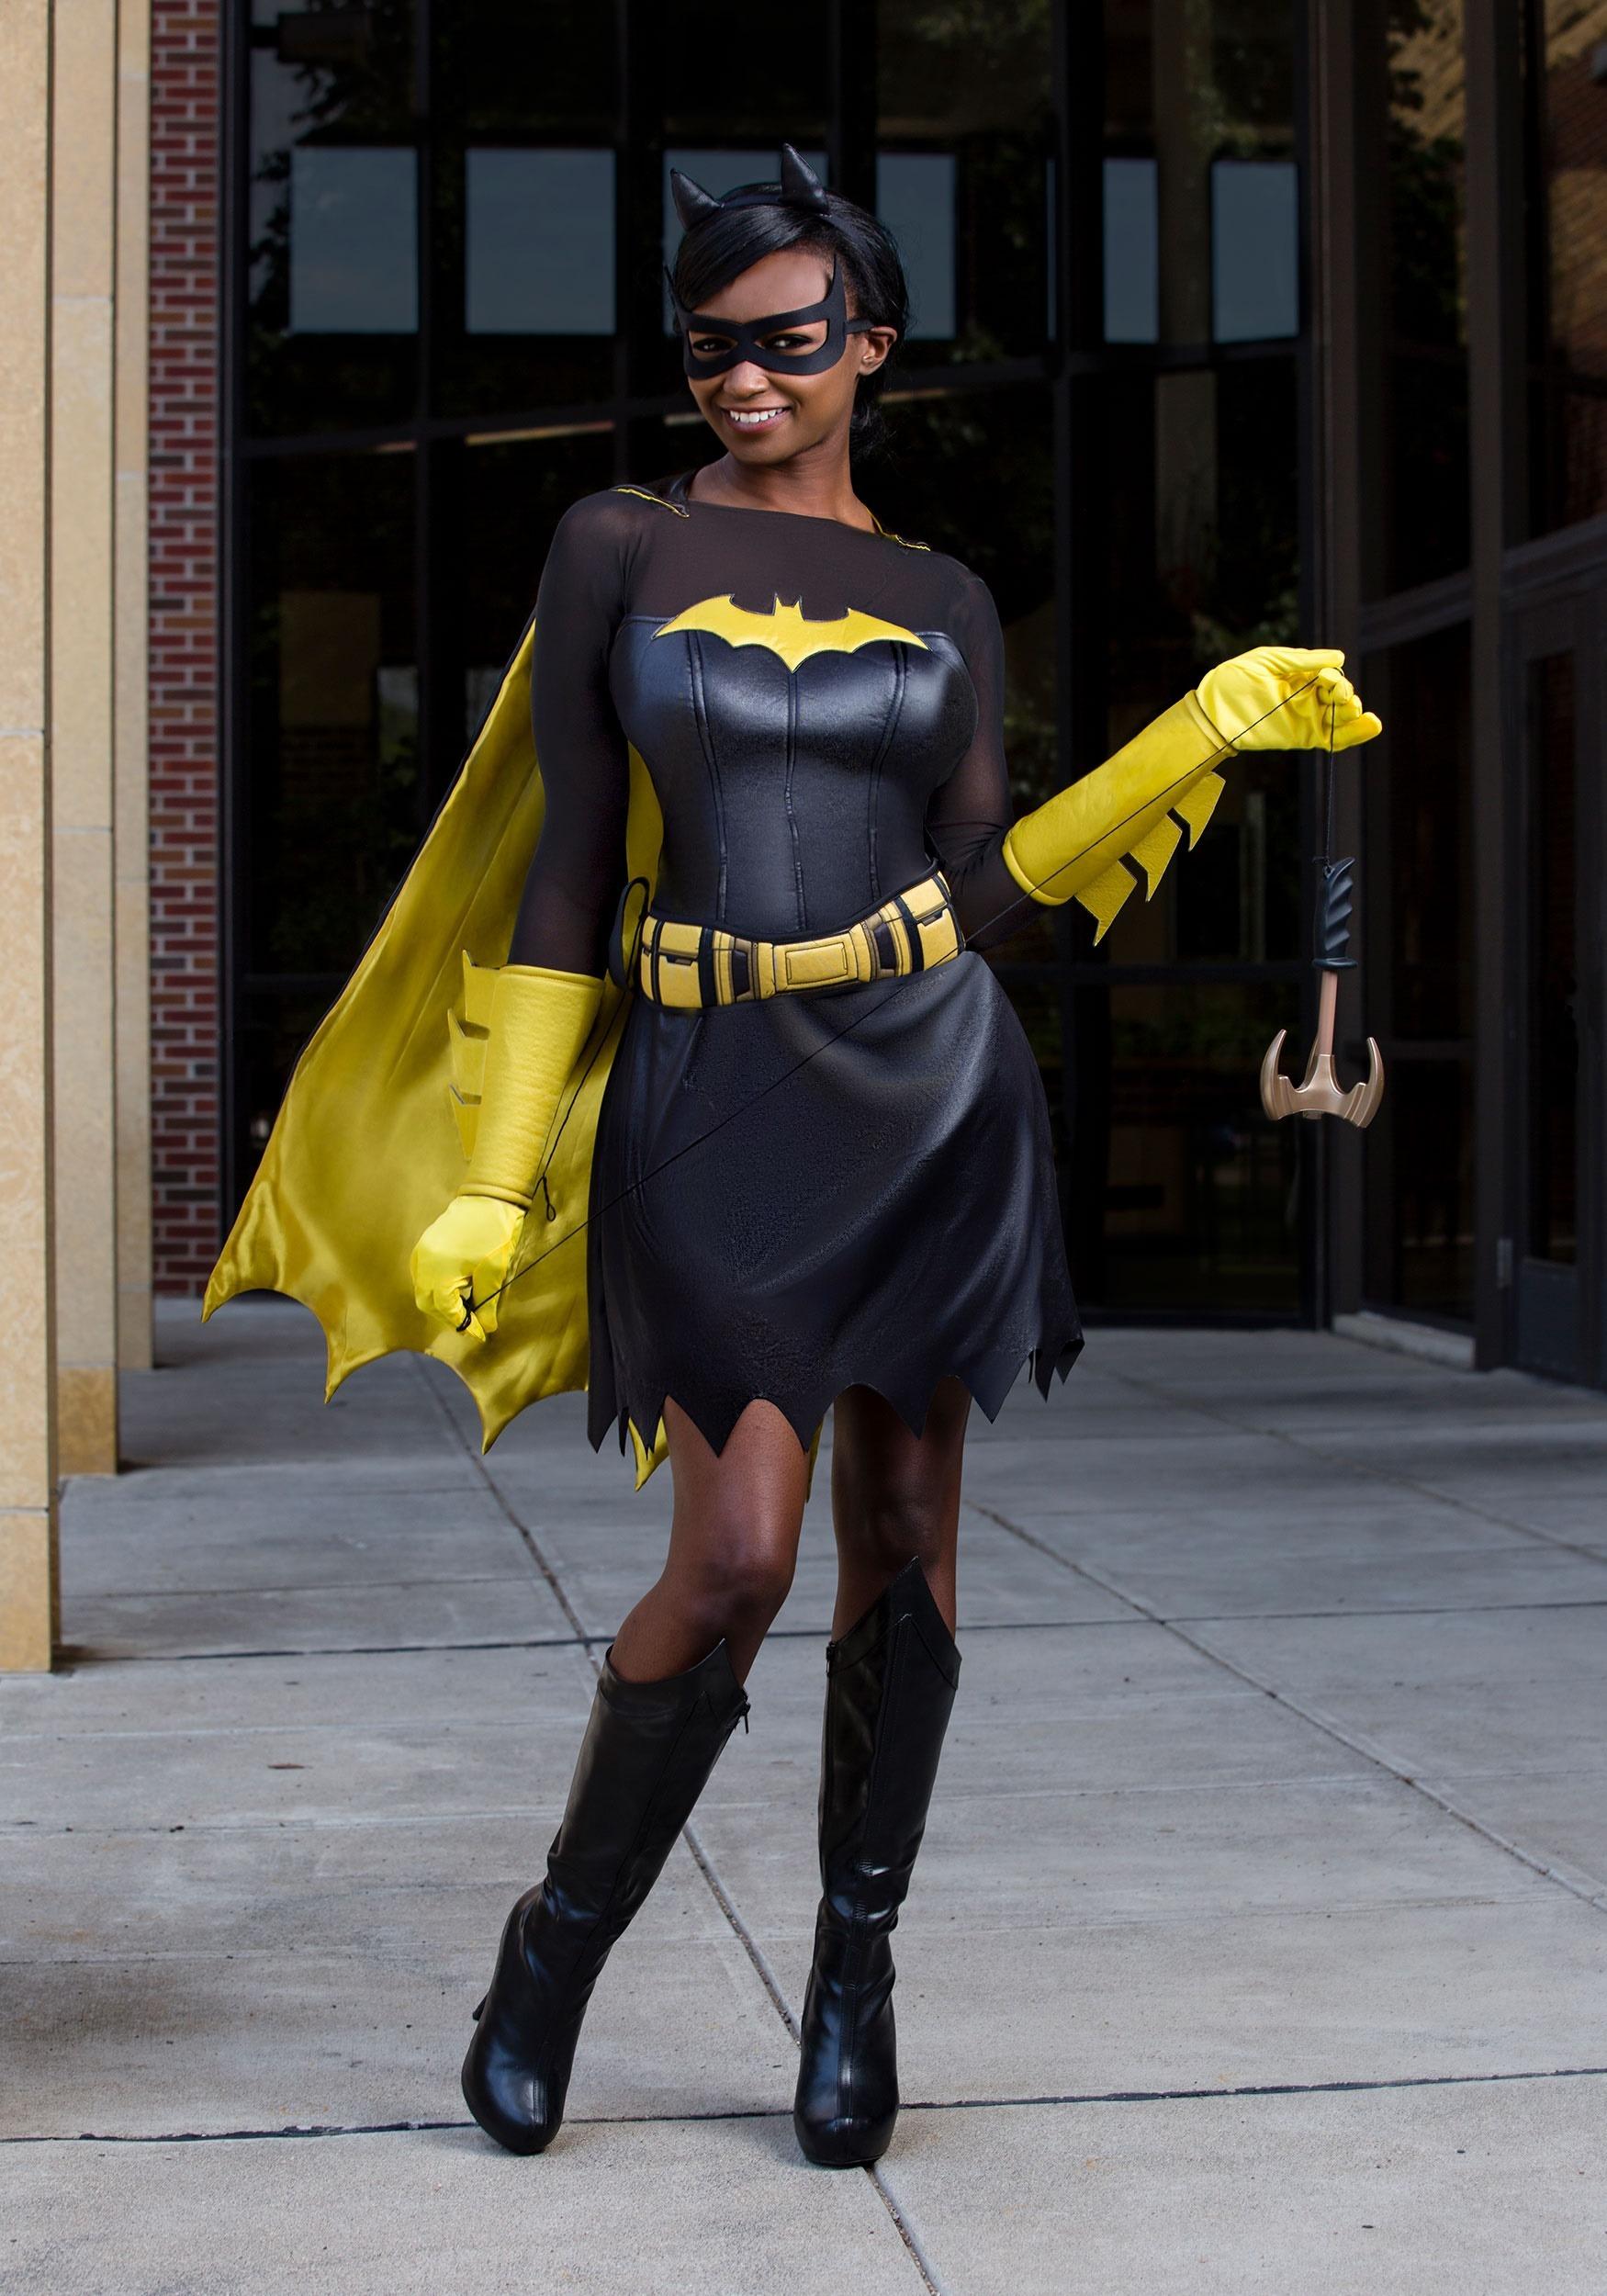 Dc Deluxe Batgirl Womens Costume-6322